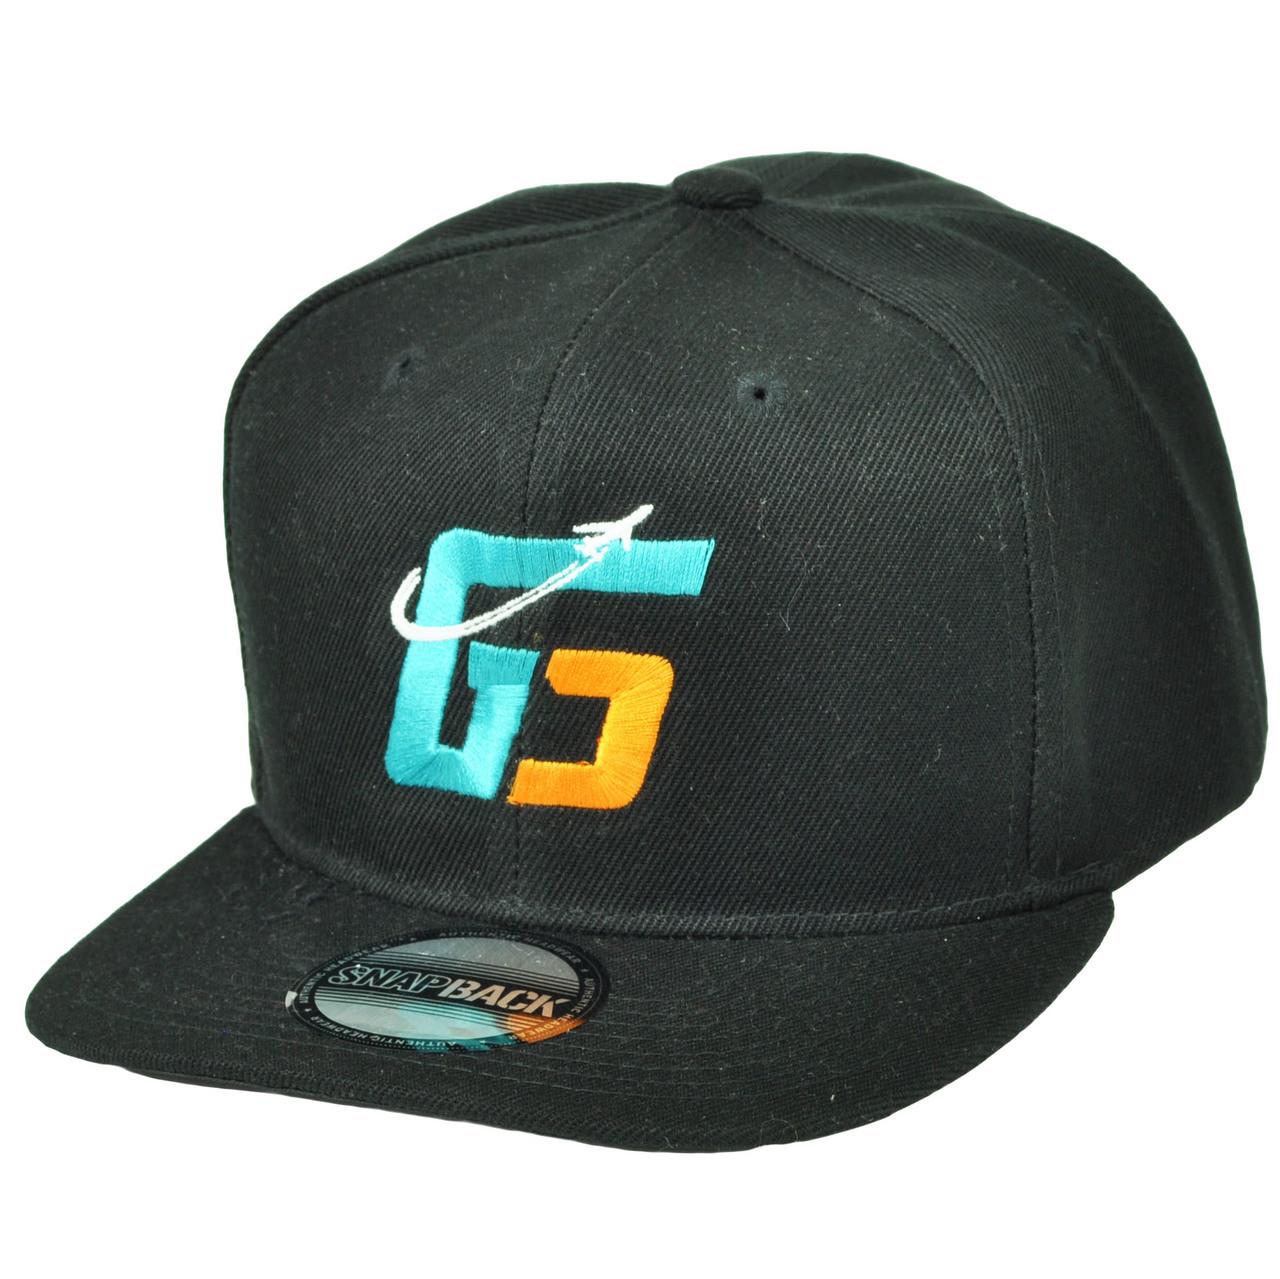 ef658699 NFL Reshad Jones G5 Safety Miami Dolphins Snapback Flat Bill Hat Cap Black  Sport